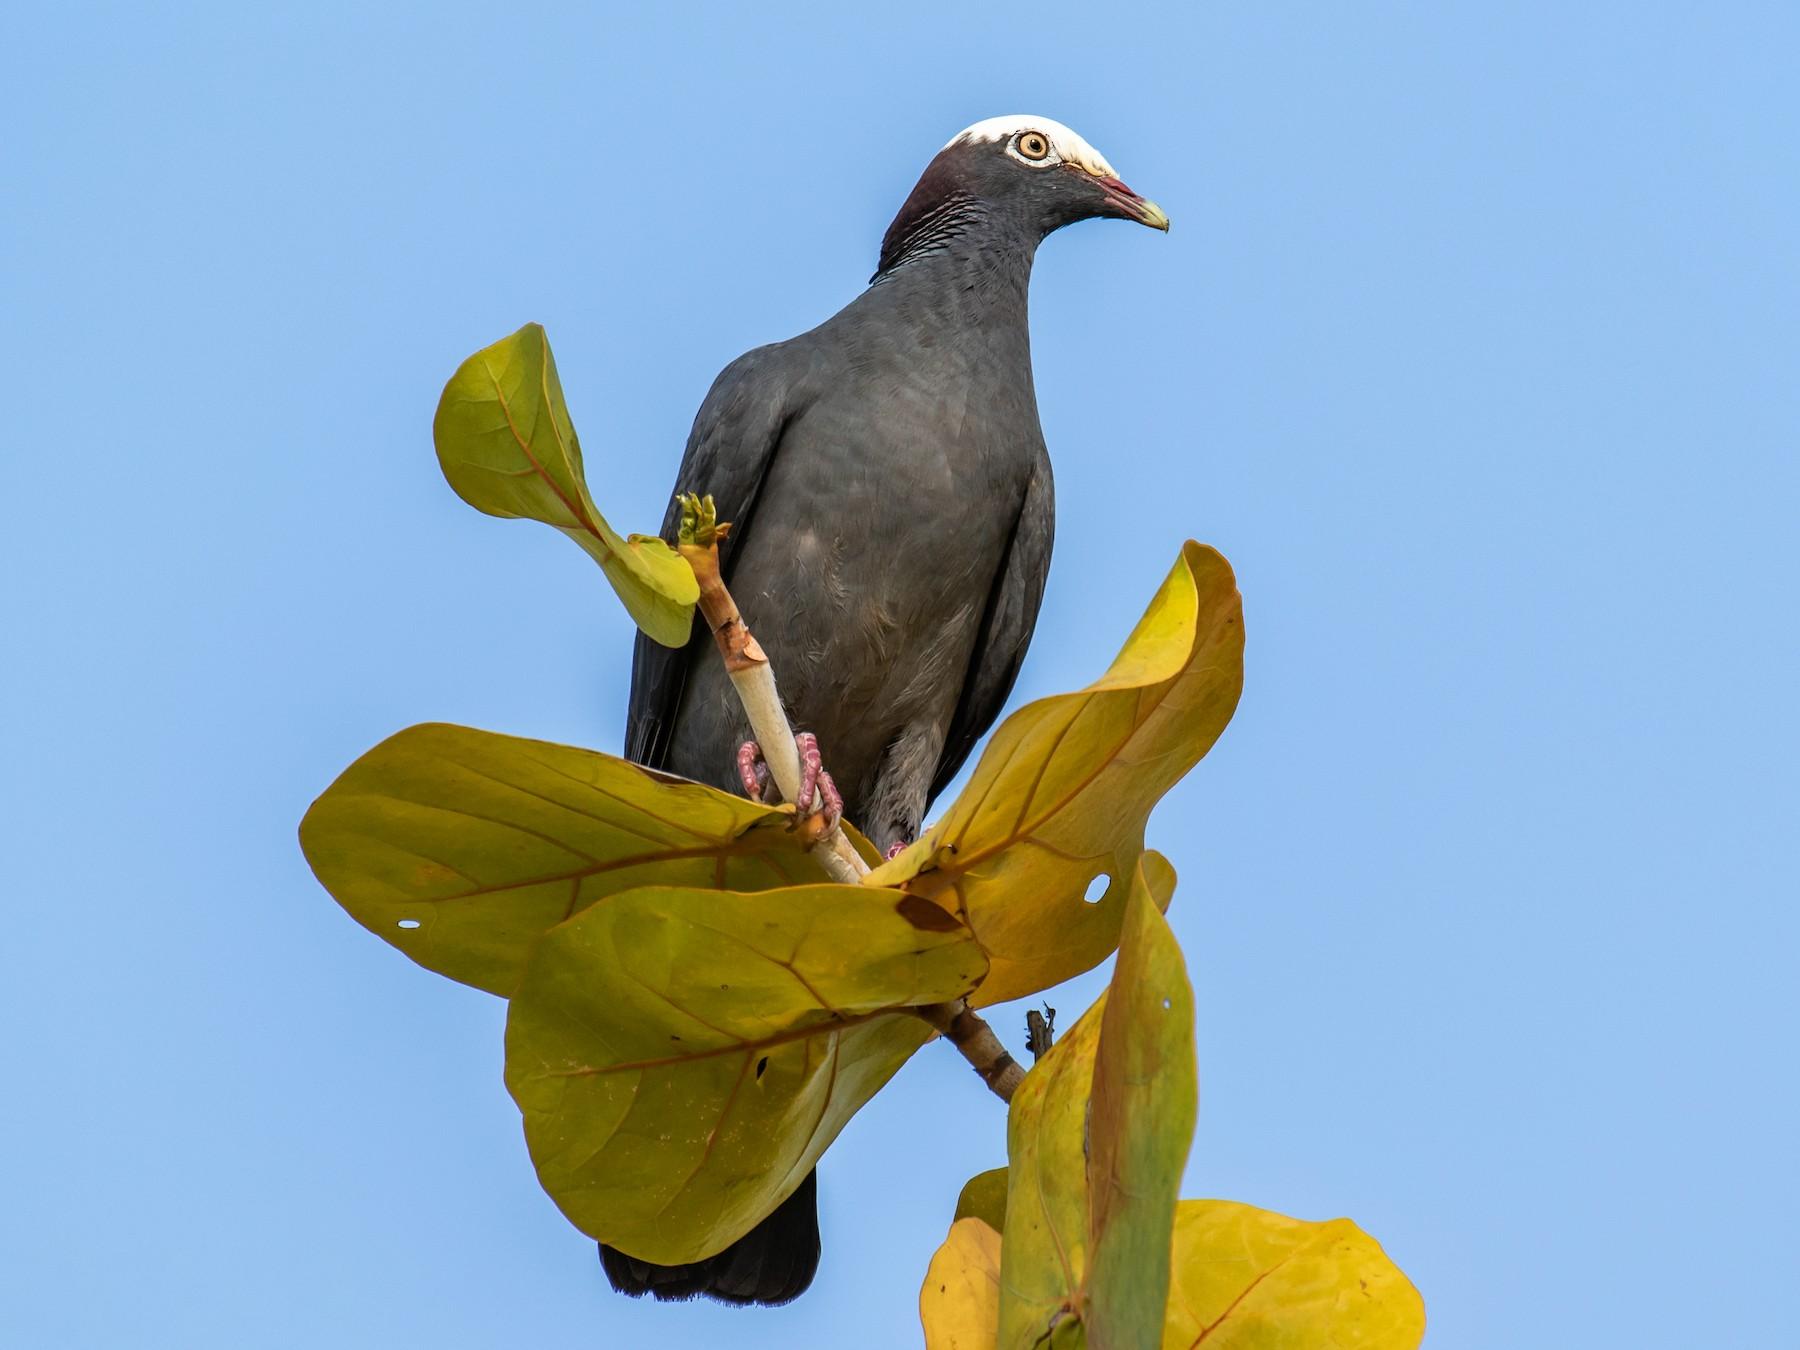 White-crowned Pigeon - Chris S. Wood